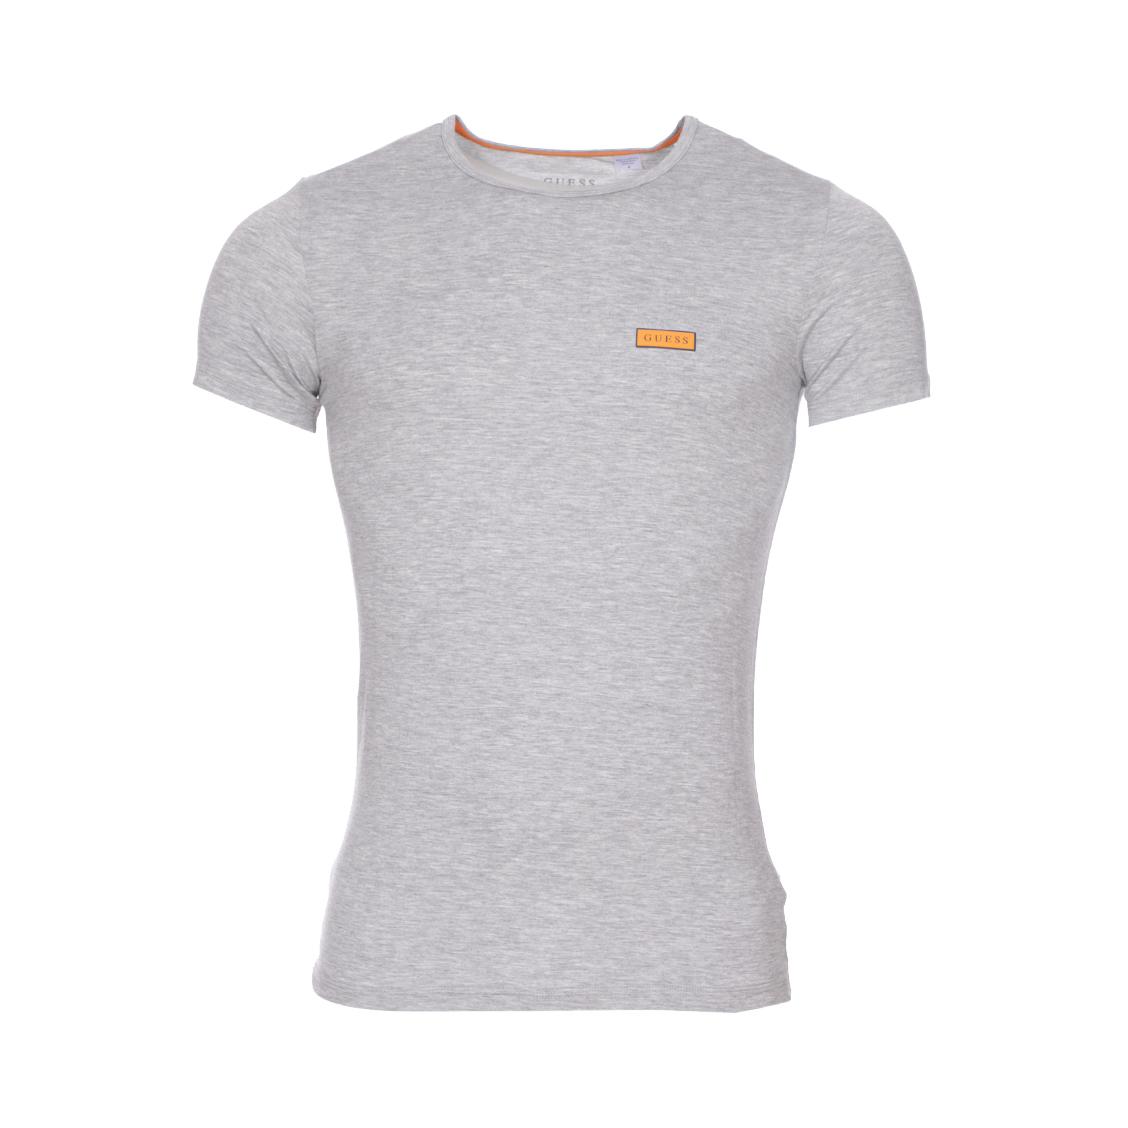 Tee-shirt col rond guess en lyocell stretch gris chiné à logo bleu marine sur fond orange